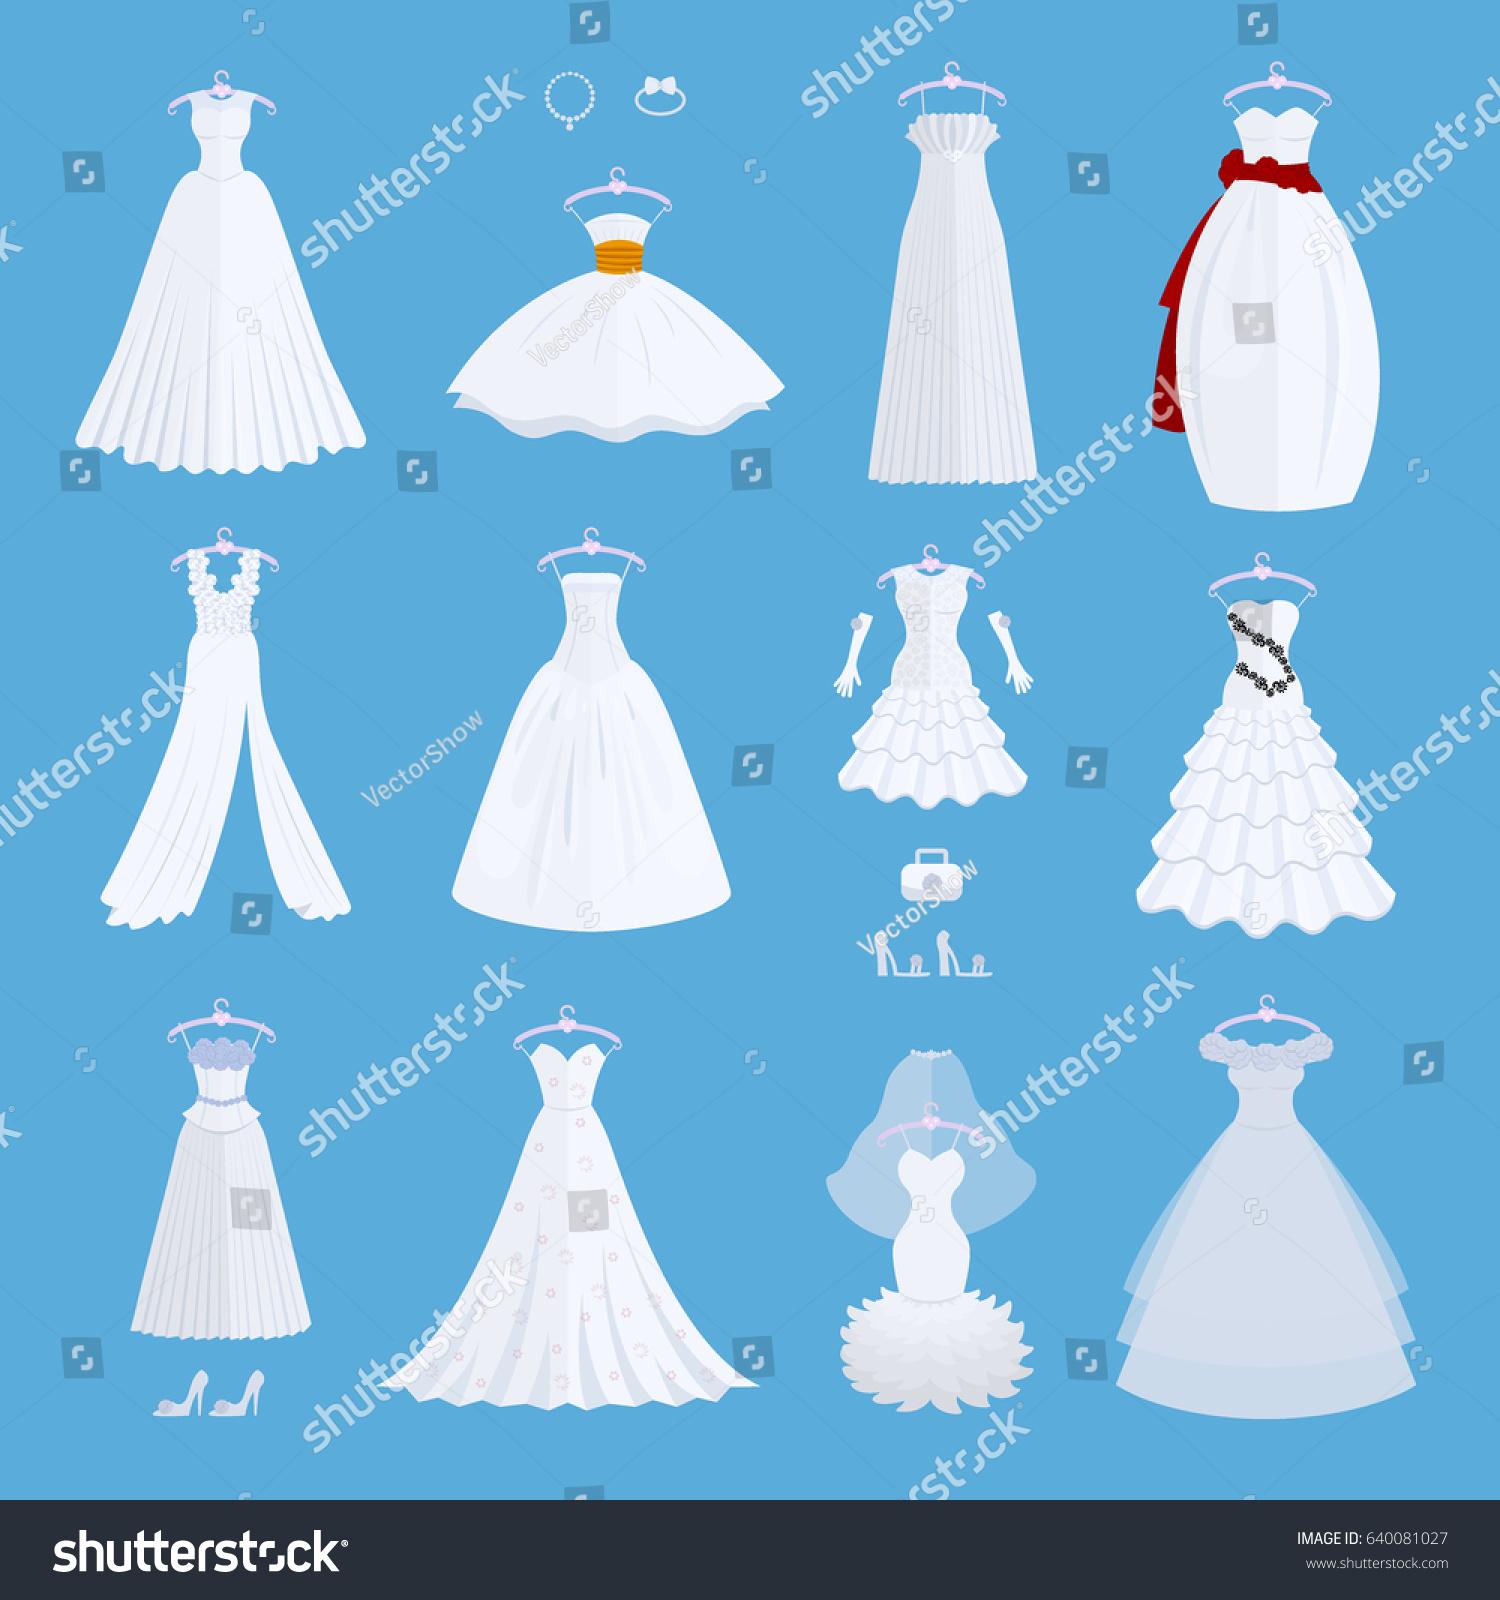 Wedding Bride Dress Elegance Style Celebration Stock Vector ...